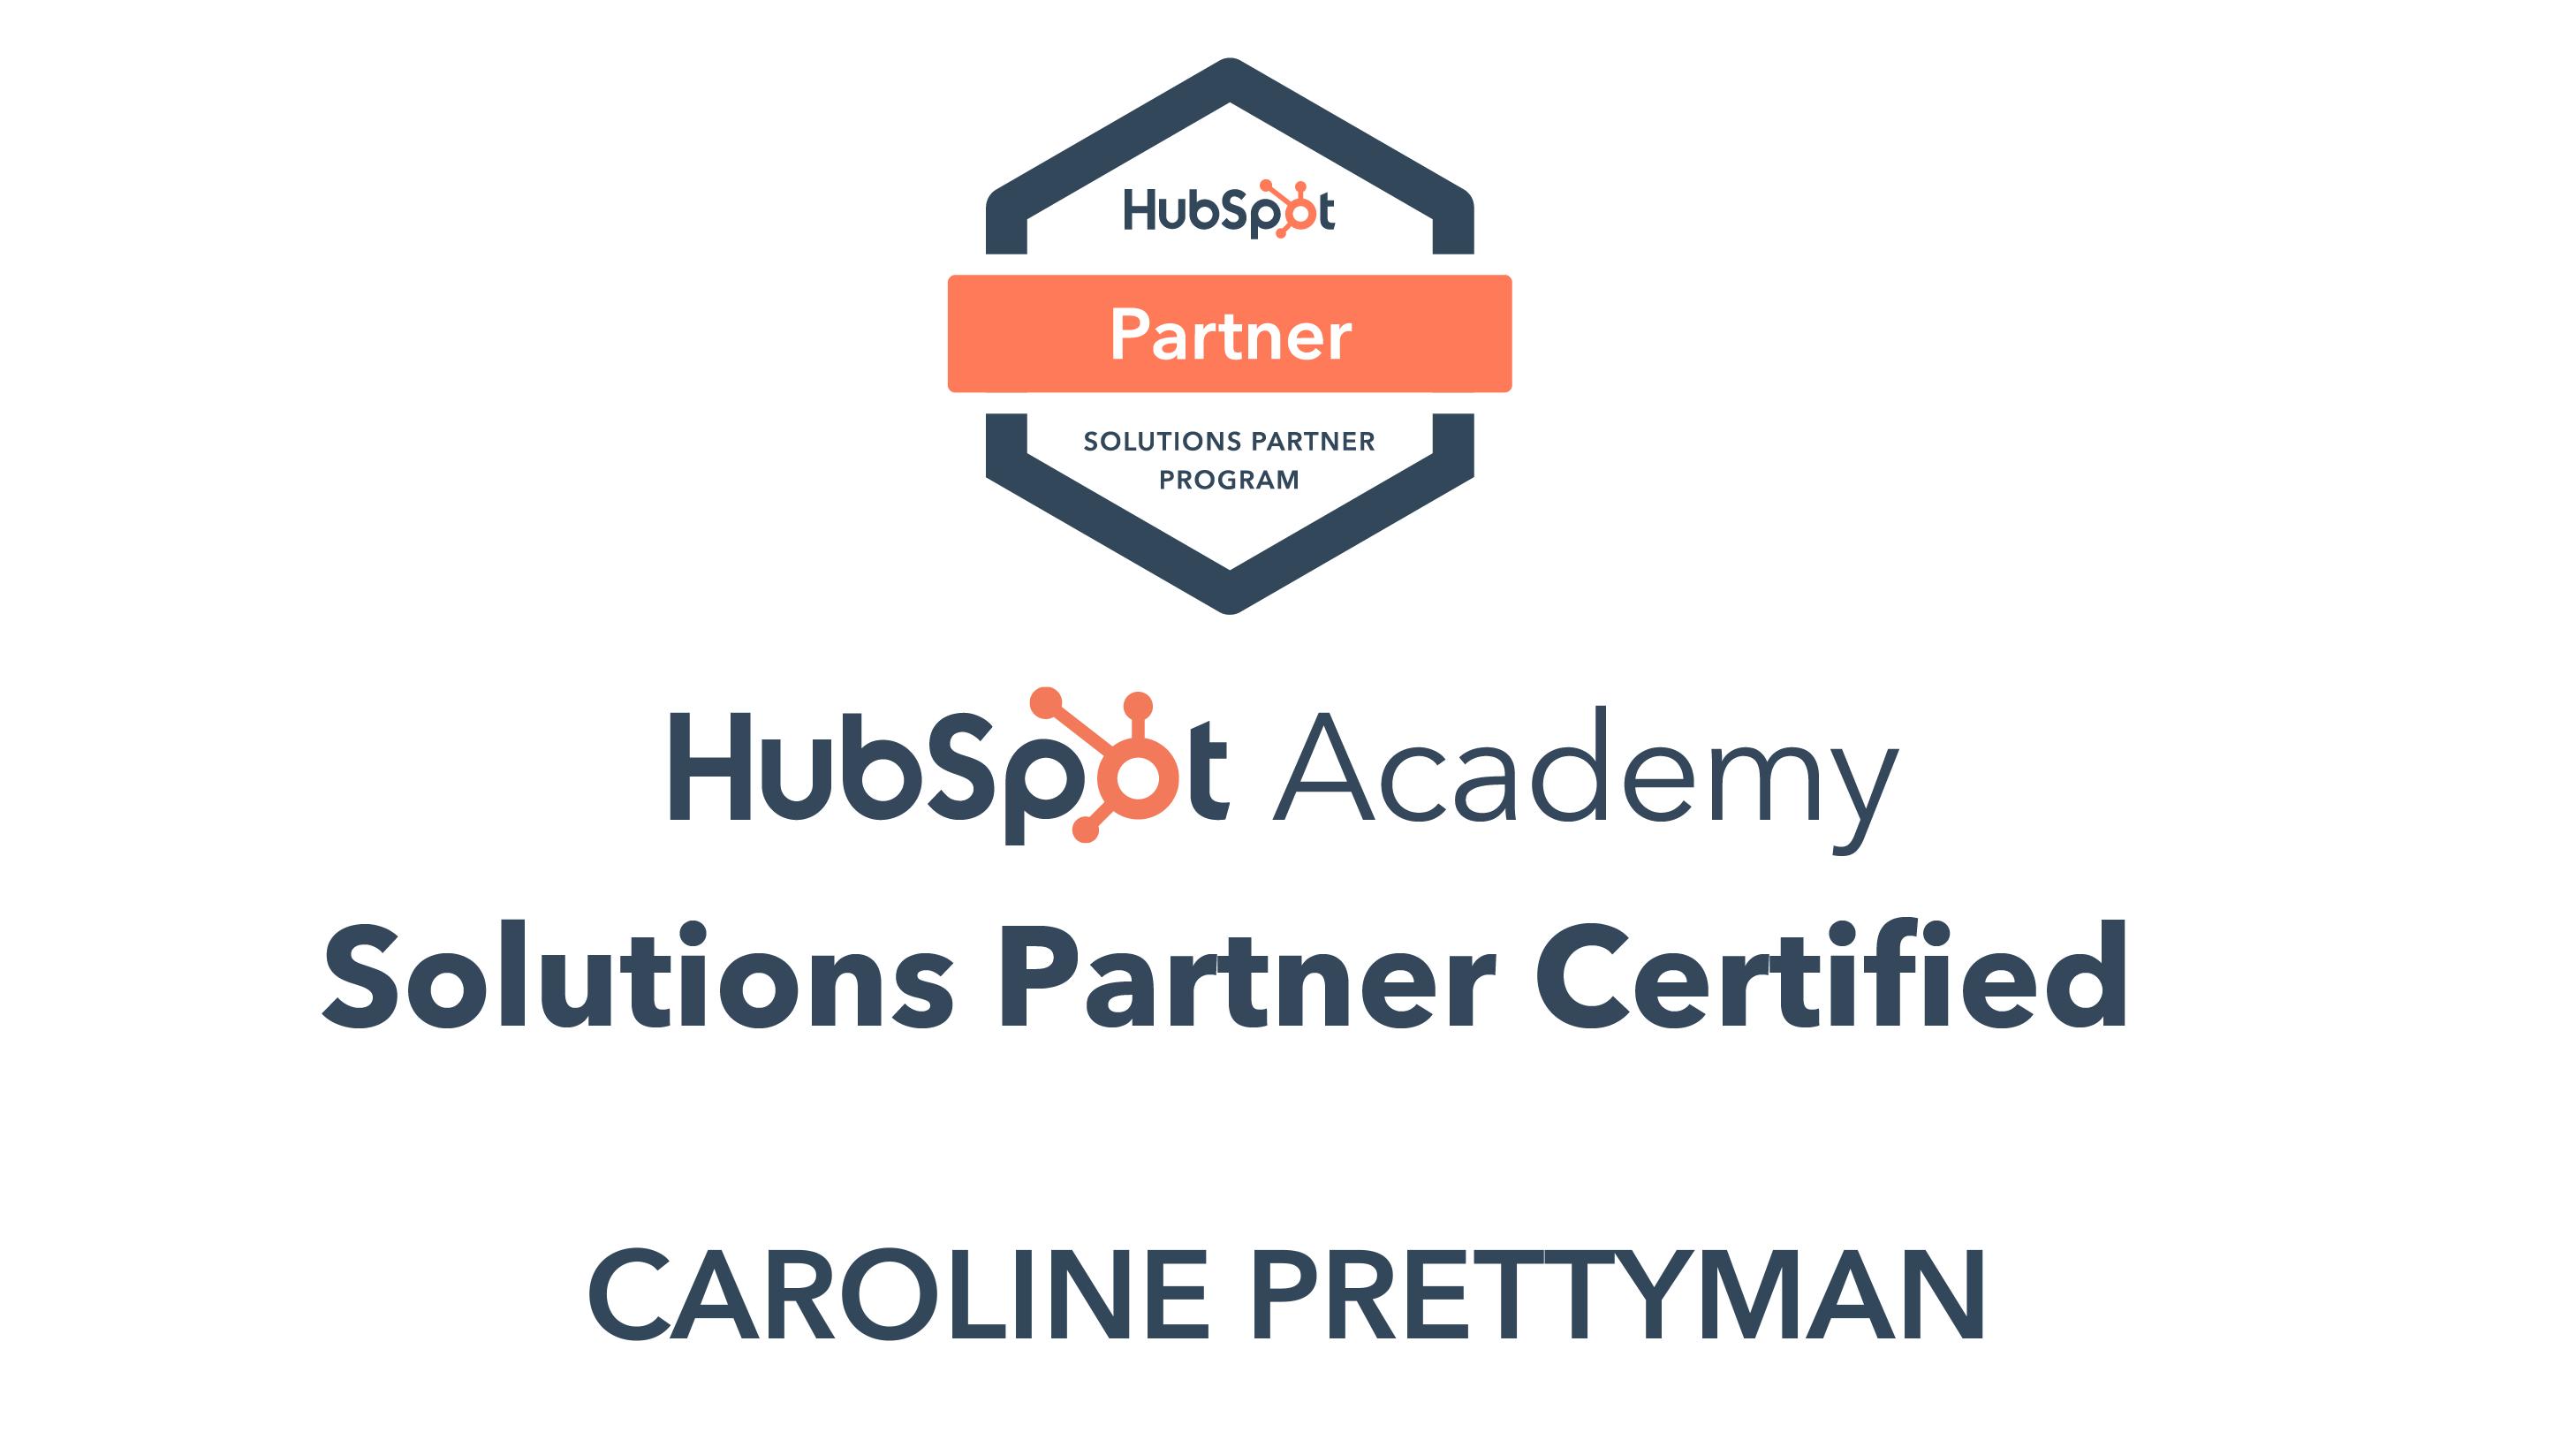 HubSpot Solutions Partner Certified